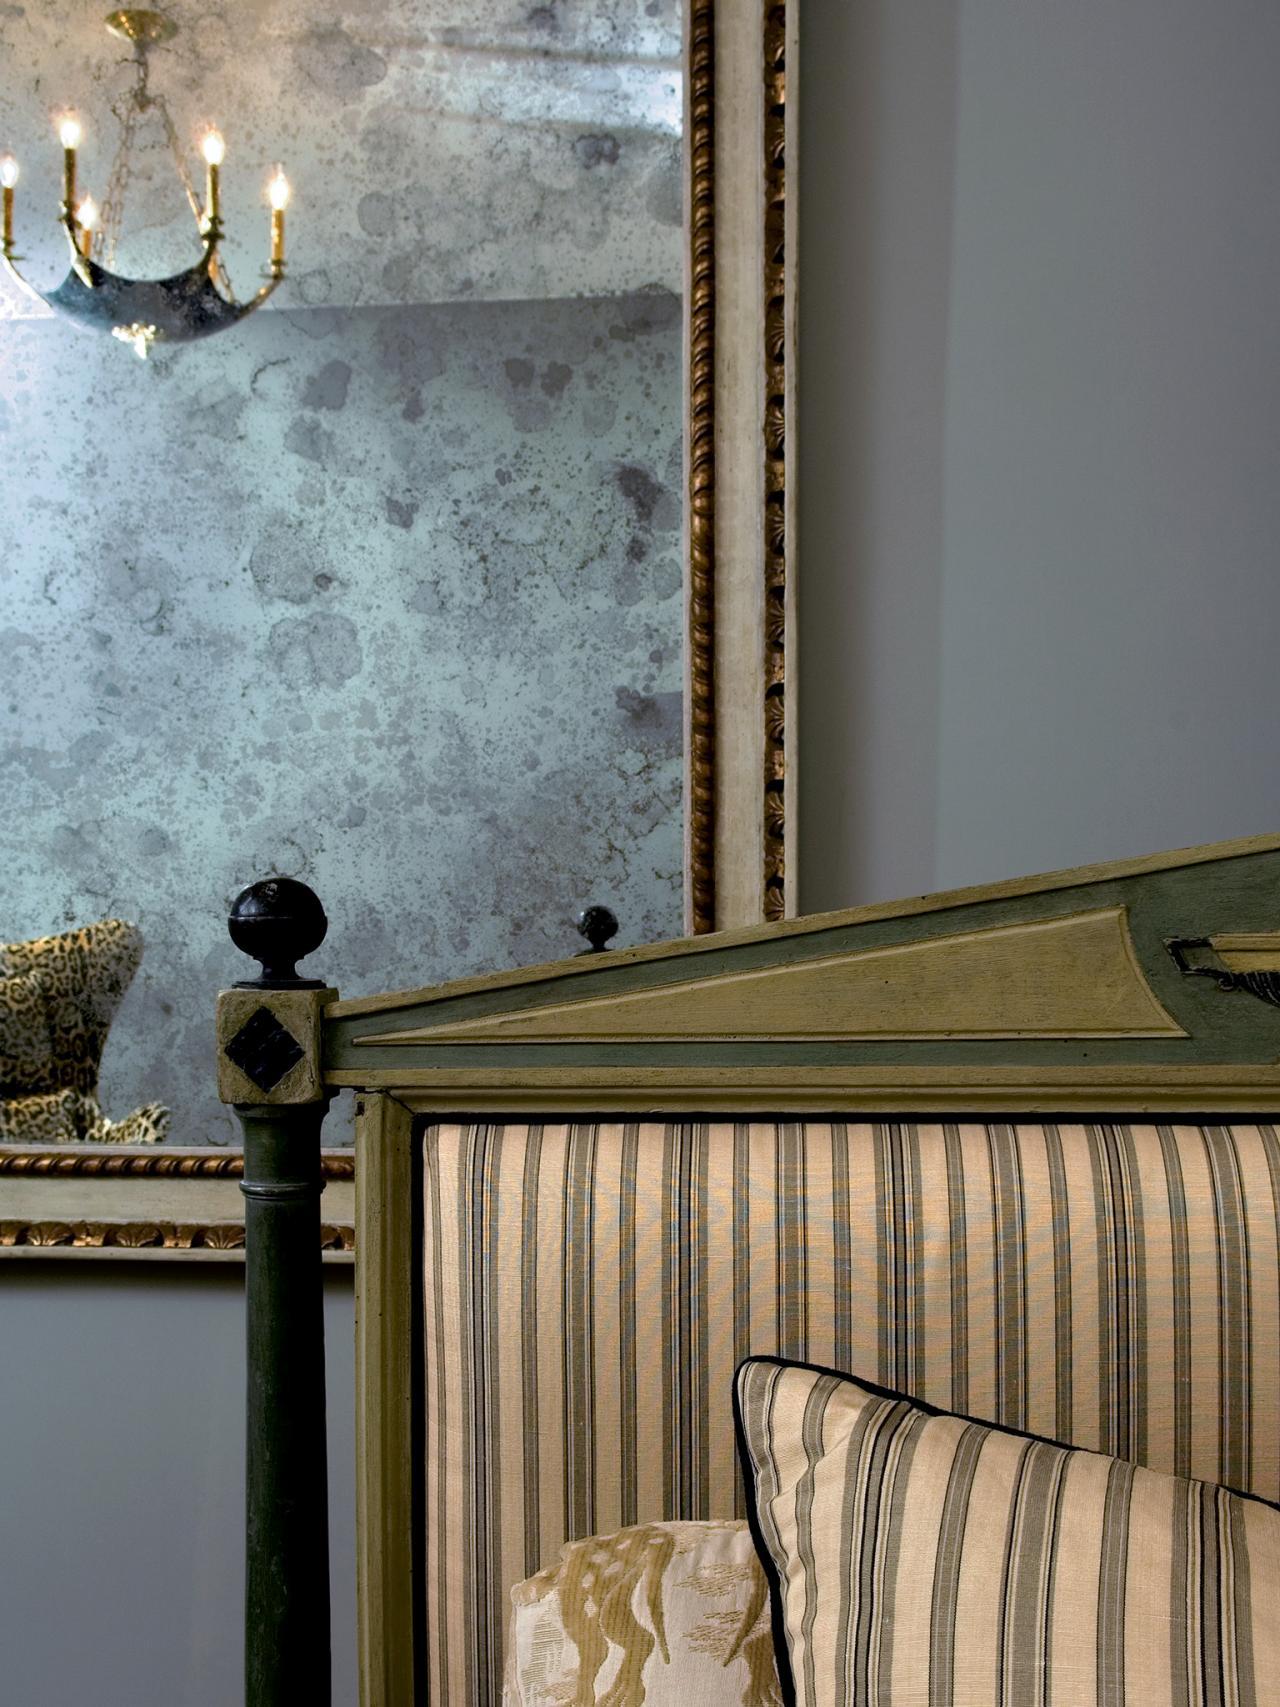 CI-Farrow-And-Ball-The-Art-of-Color-pg113_large-Georgian-mirror_3x4_jpg_rend_hgtvcom_1280_1707.jpg